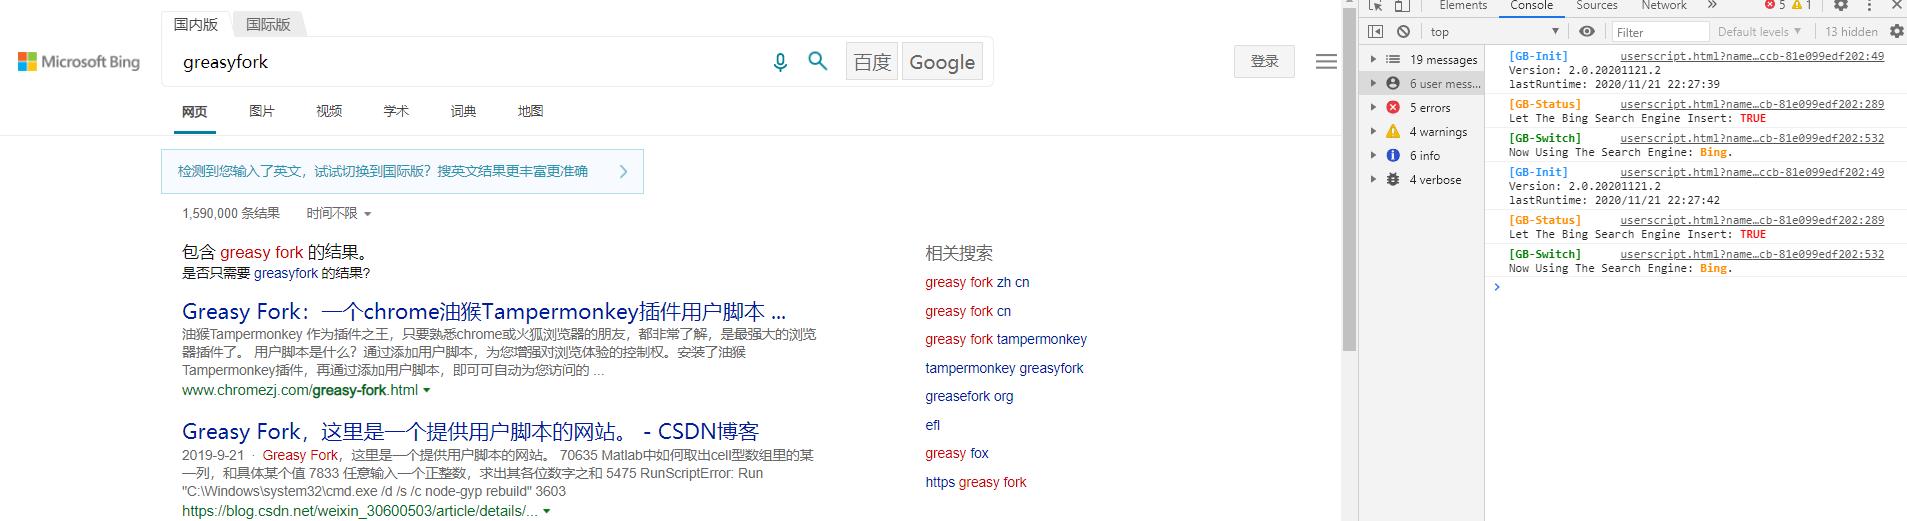 BING.COM搜索的页面